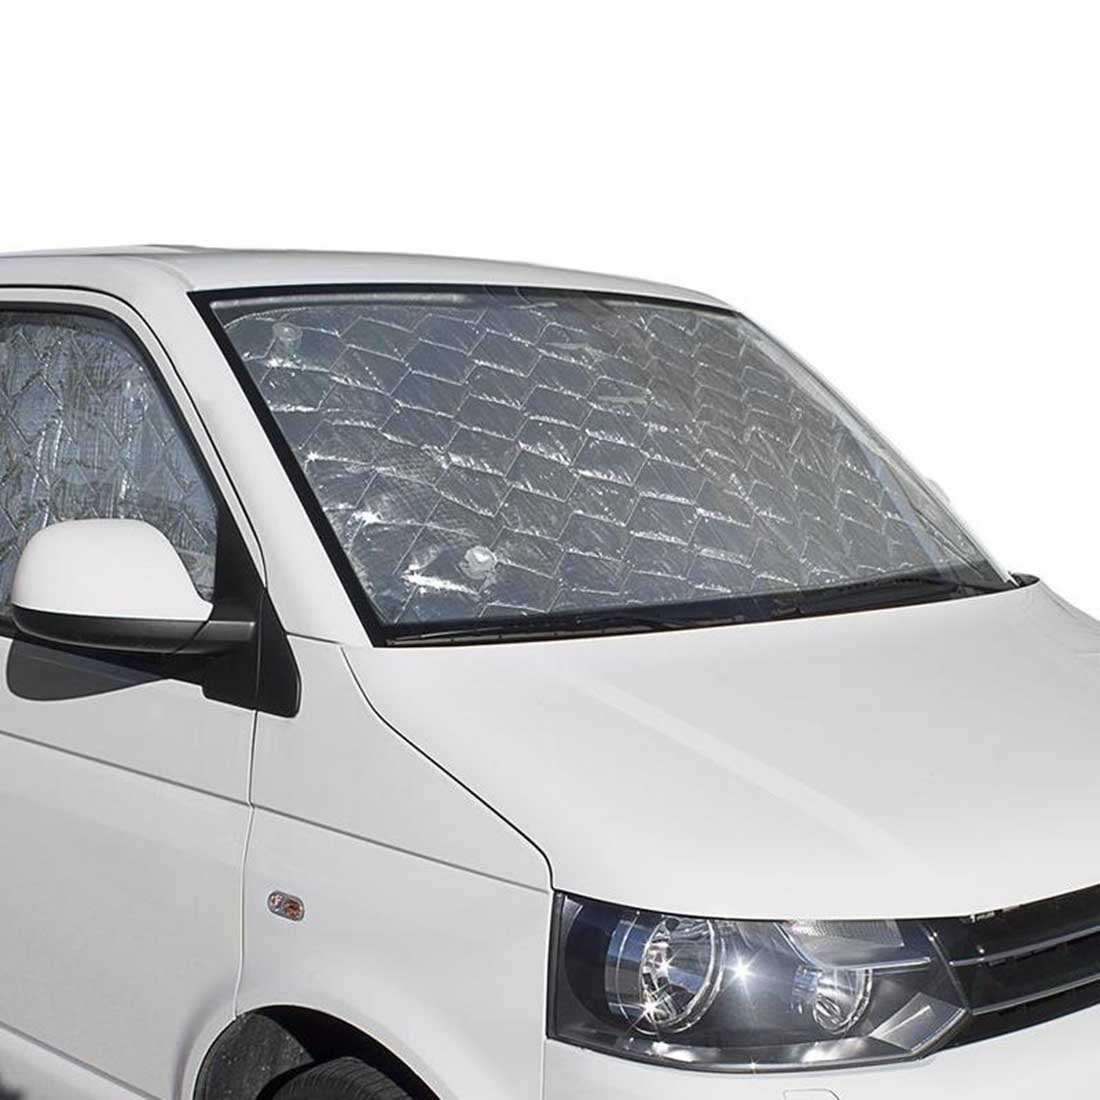 VW T6 cab window silver screens.